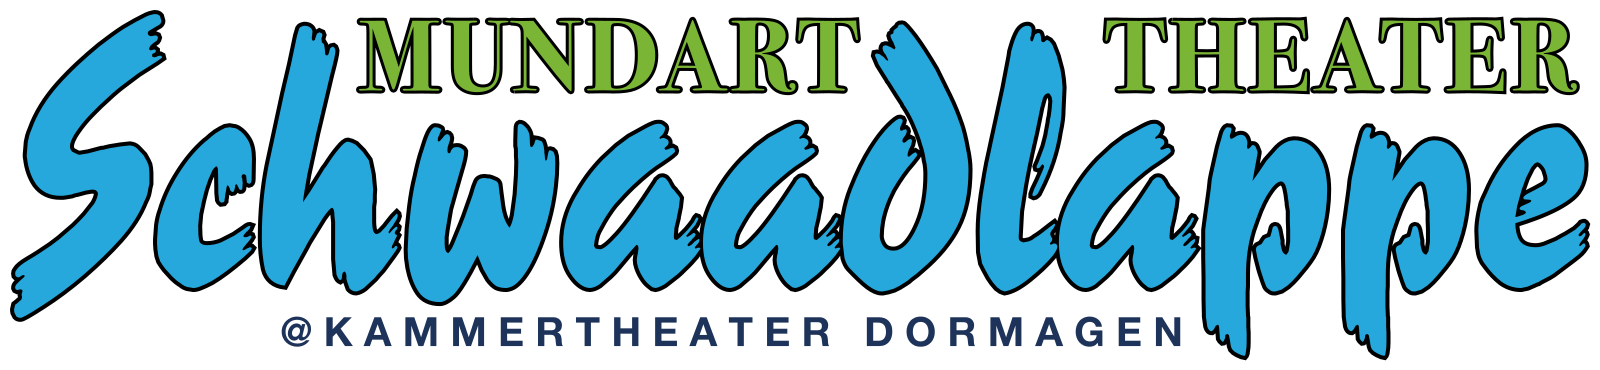 Mundart-Theater Schwaadlappe @ Kammertheater Dormagen